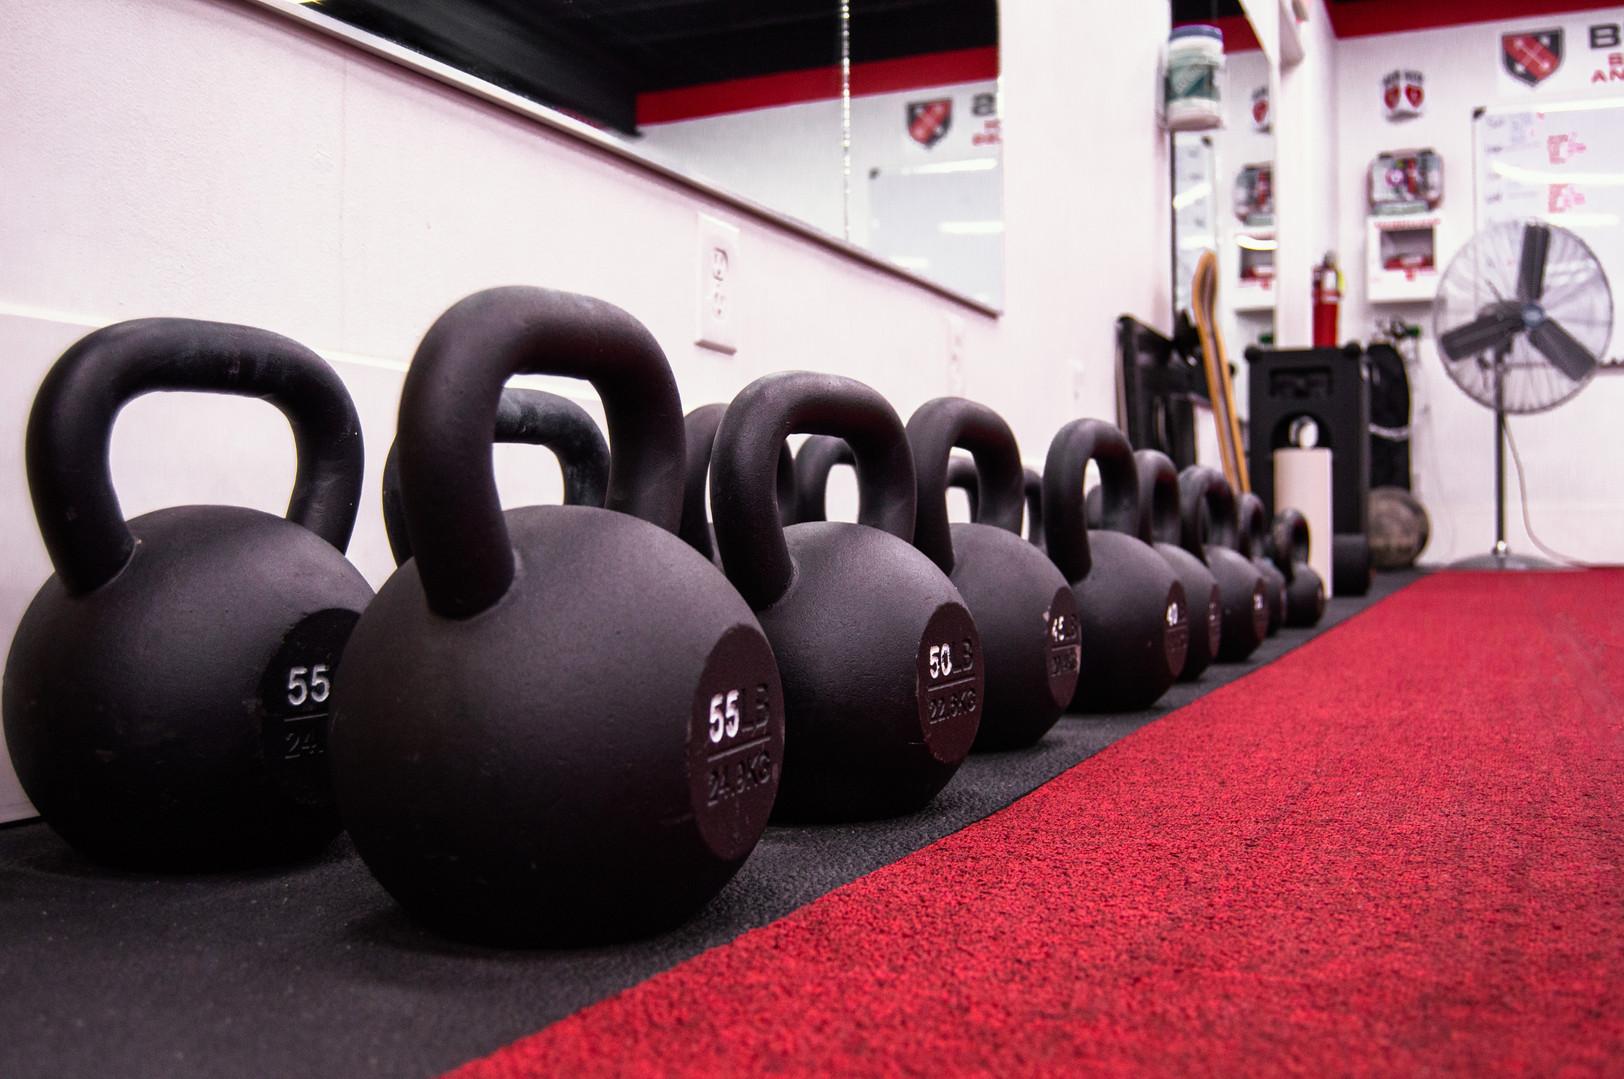 gym-equipment-bucks-training-7.jpg